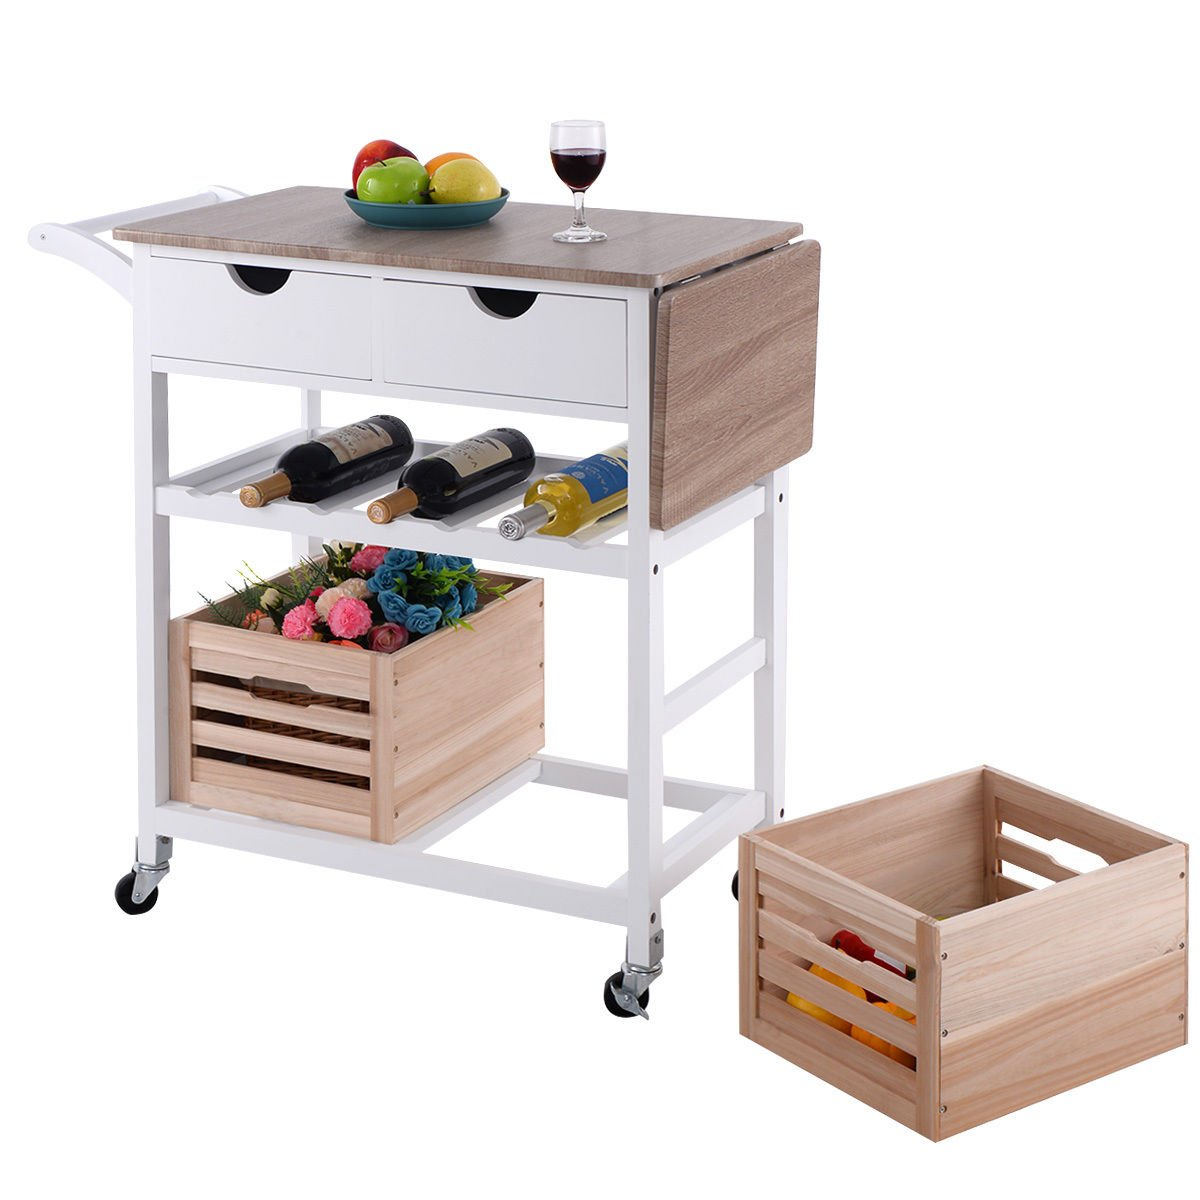 Amazon.com - Costzon Kitchen Trolley Island Cart Dining Storage with ...